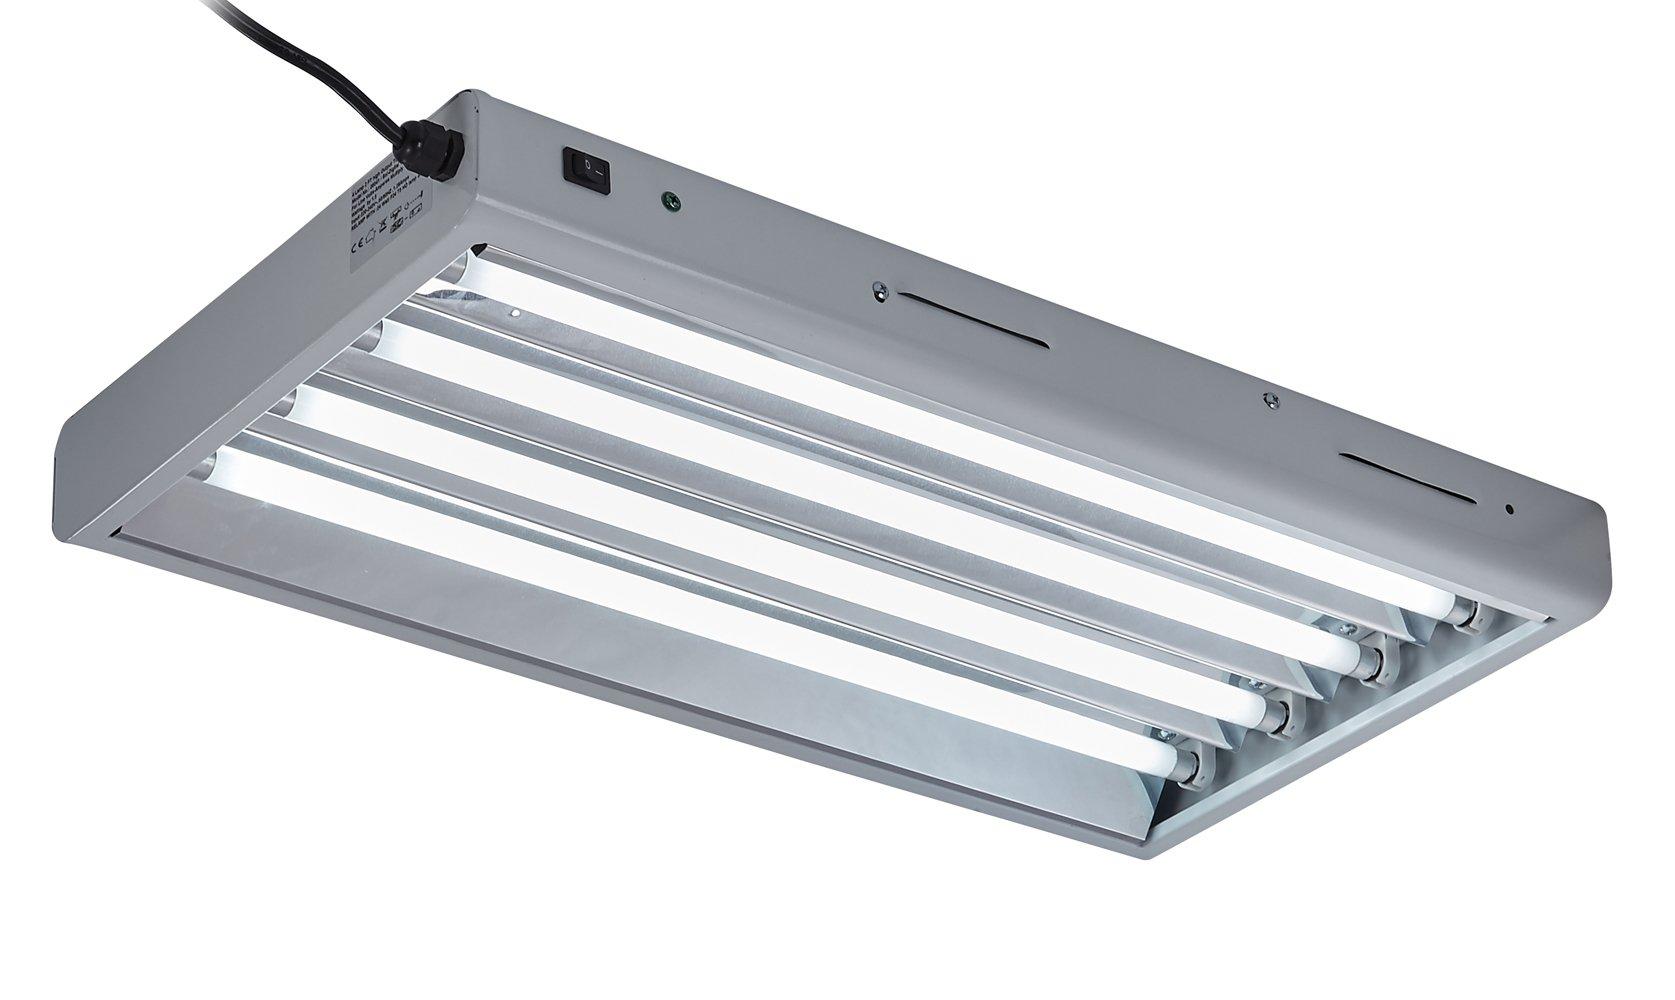 TopoLite T5 Grow Light 24W 54W 6500K Fluorescent HO 4 6 8 Bulbs Included for Indoor Growing T5 Grow Lights Fixtures (2FT/24W-4 lamp)